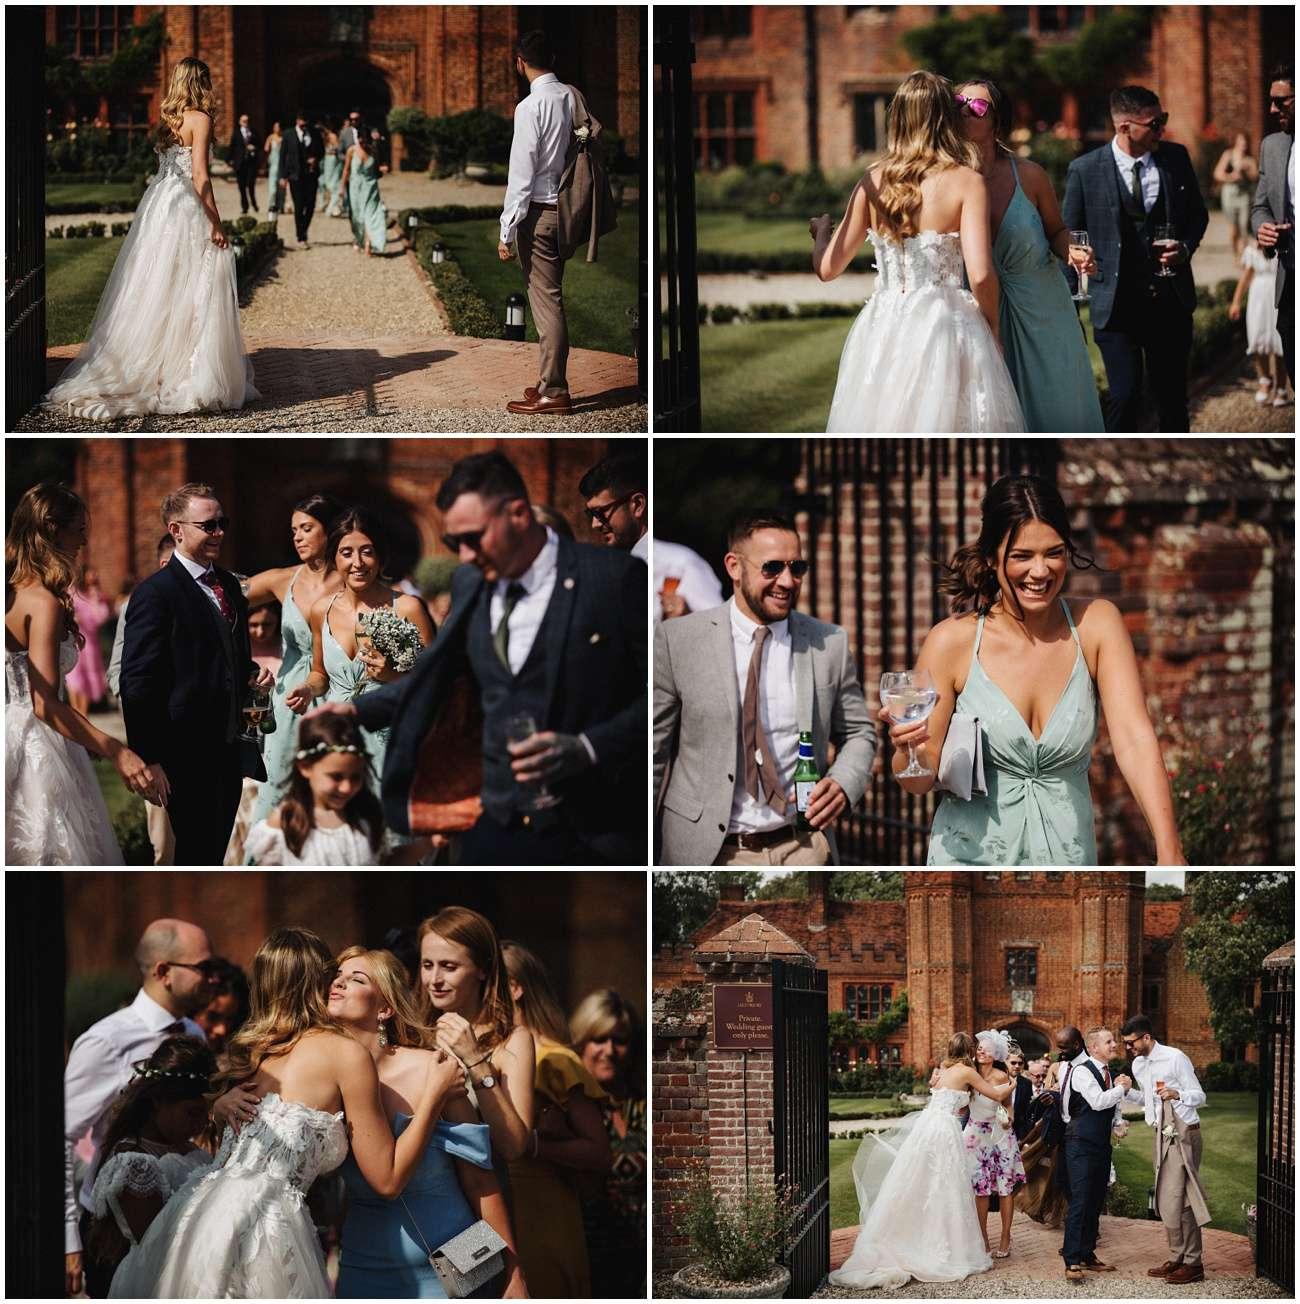 Wedding guests head towards the wedding breakfast